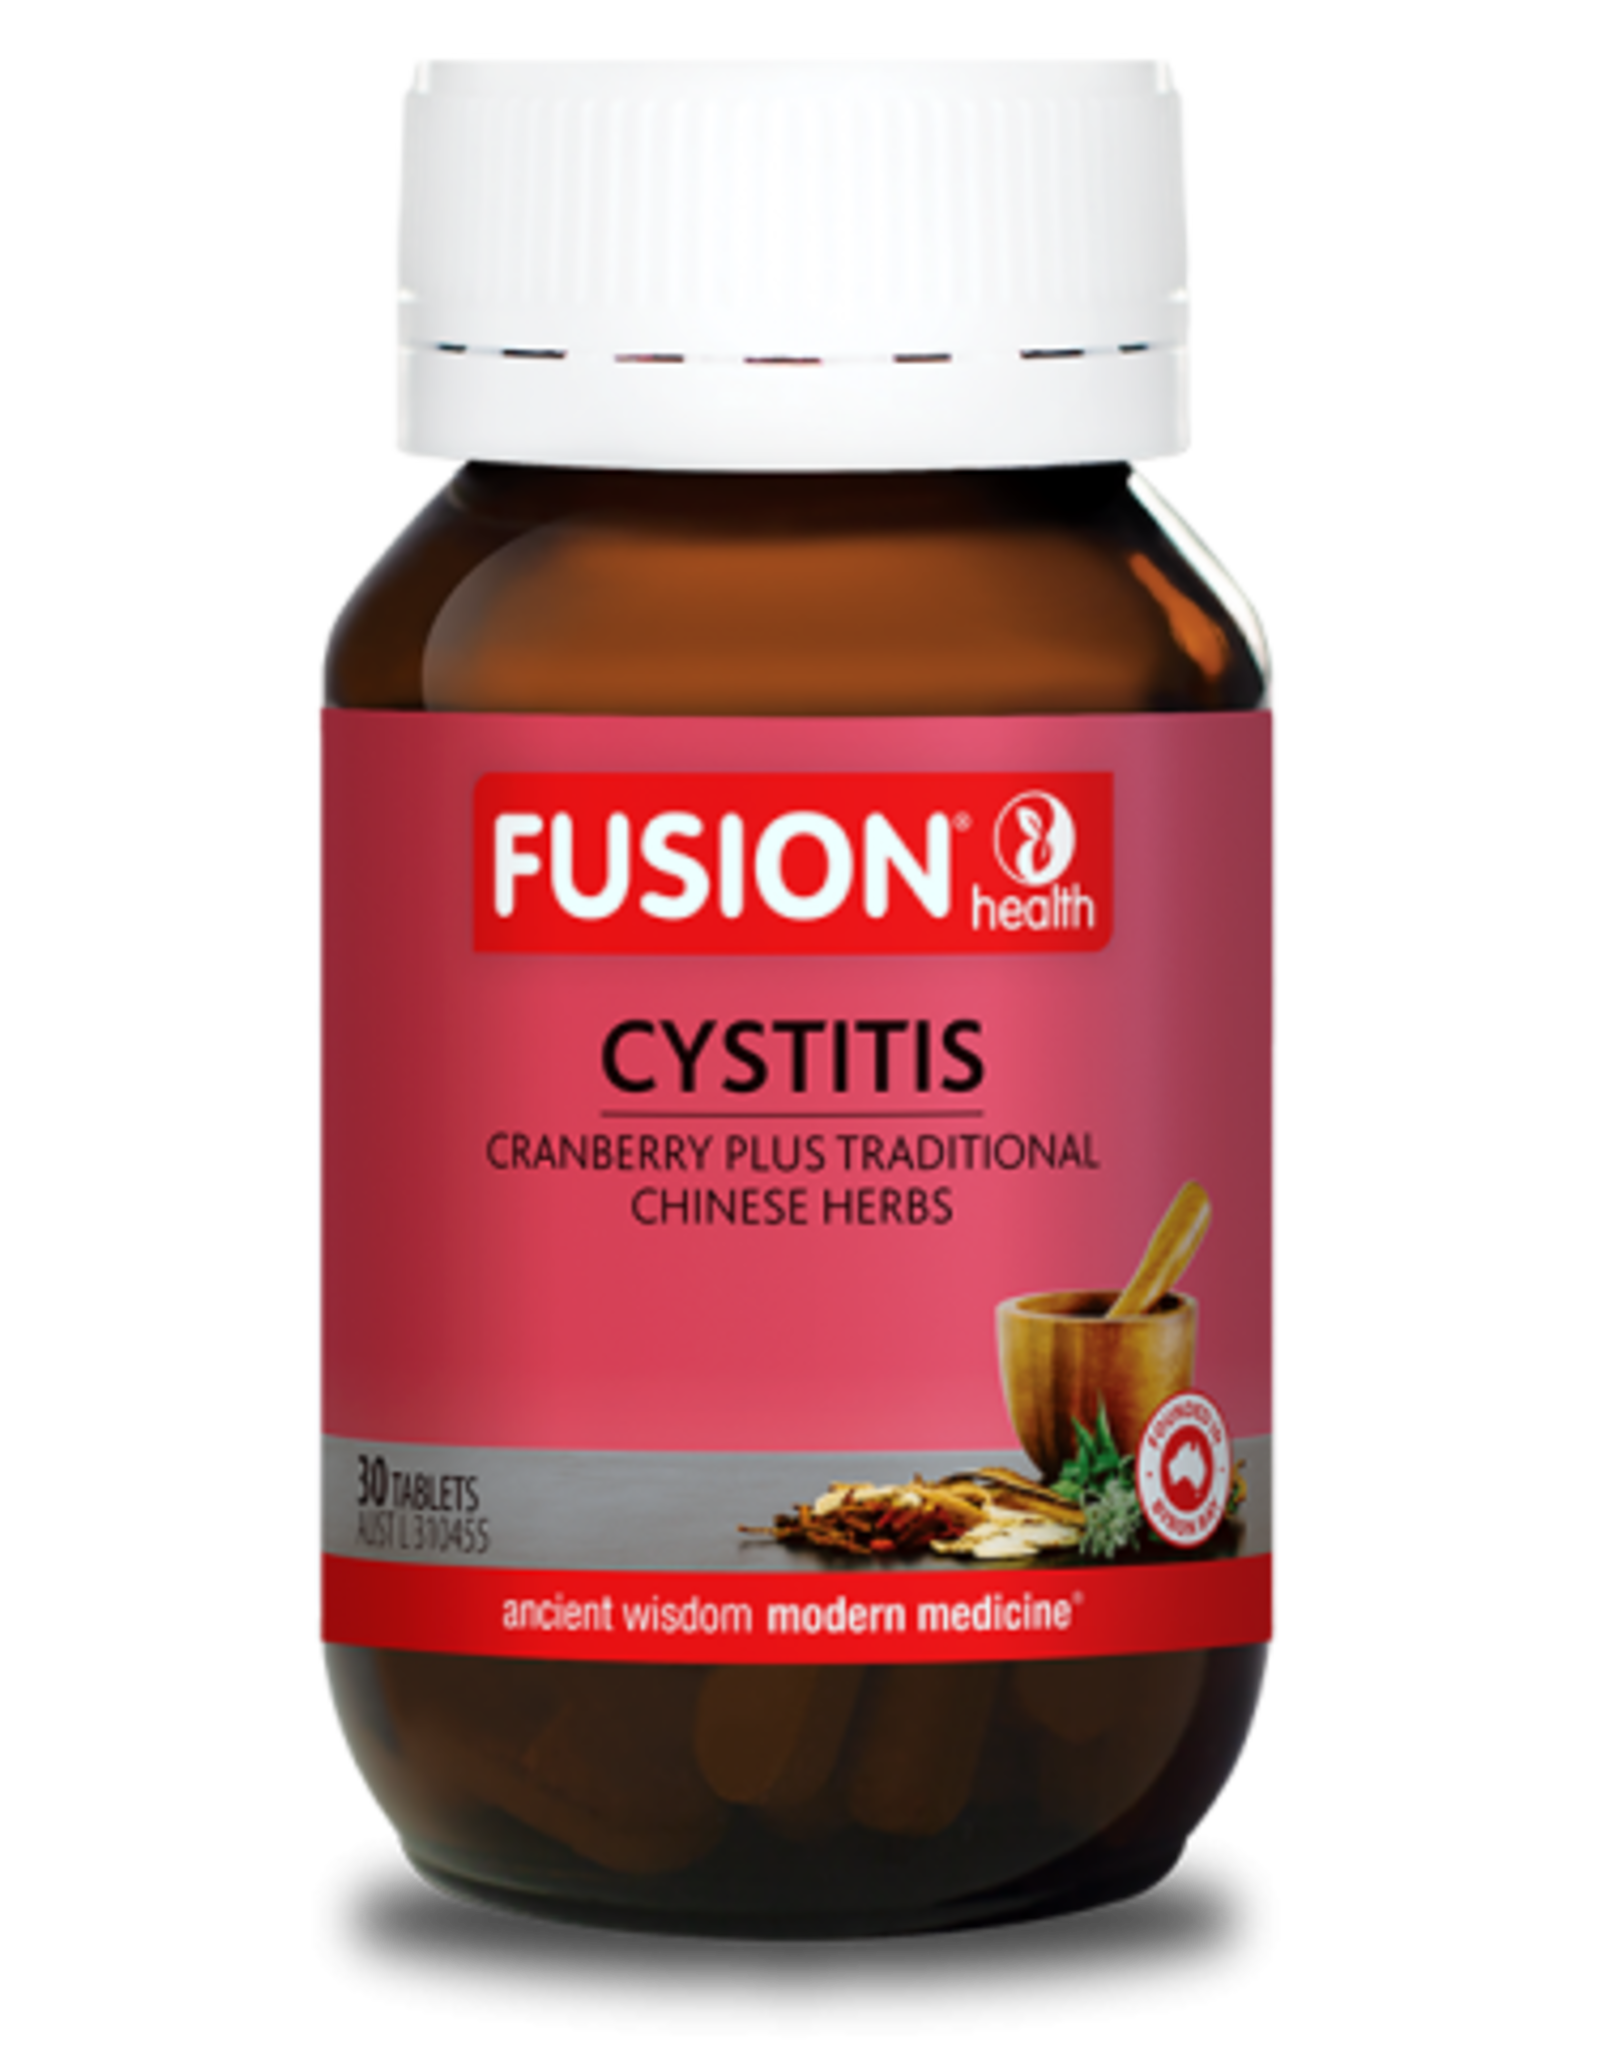 Fusion Cystitis 30t